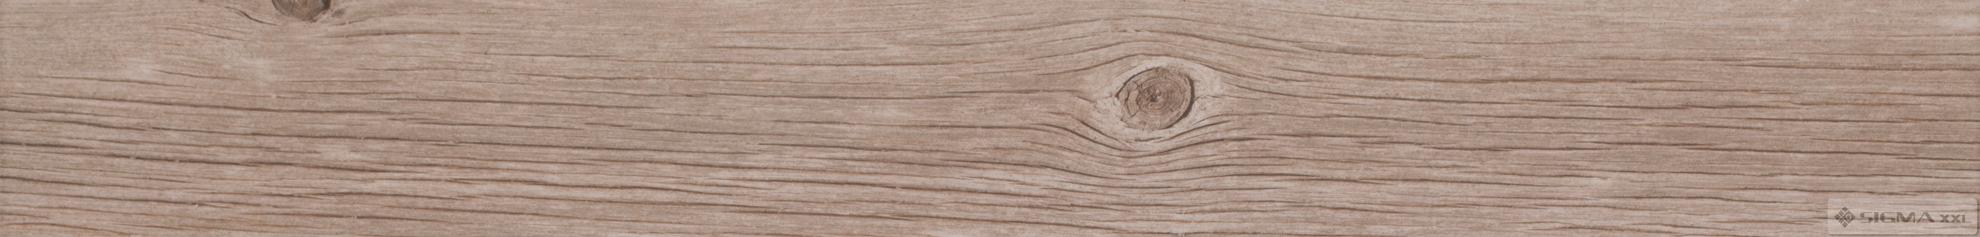 Imagine Robyn Beige Wood List